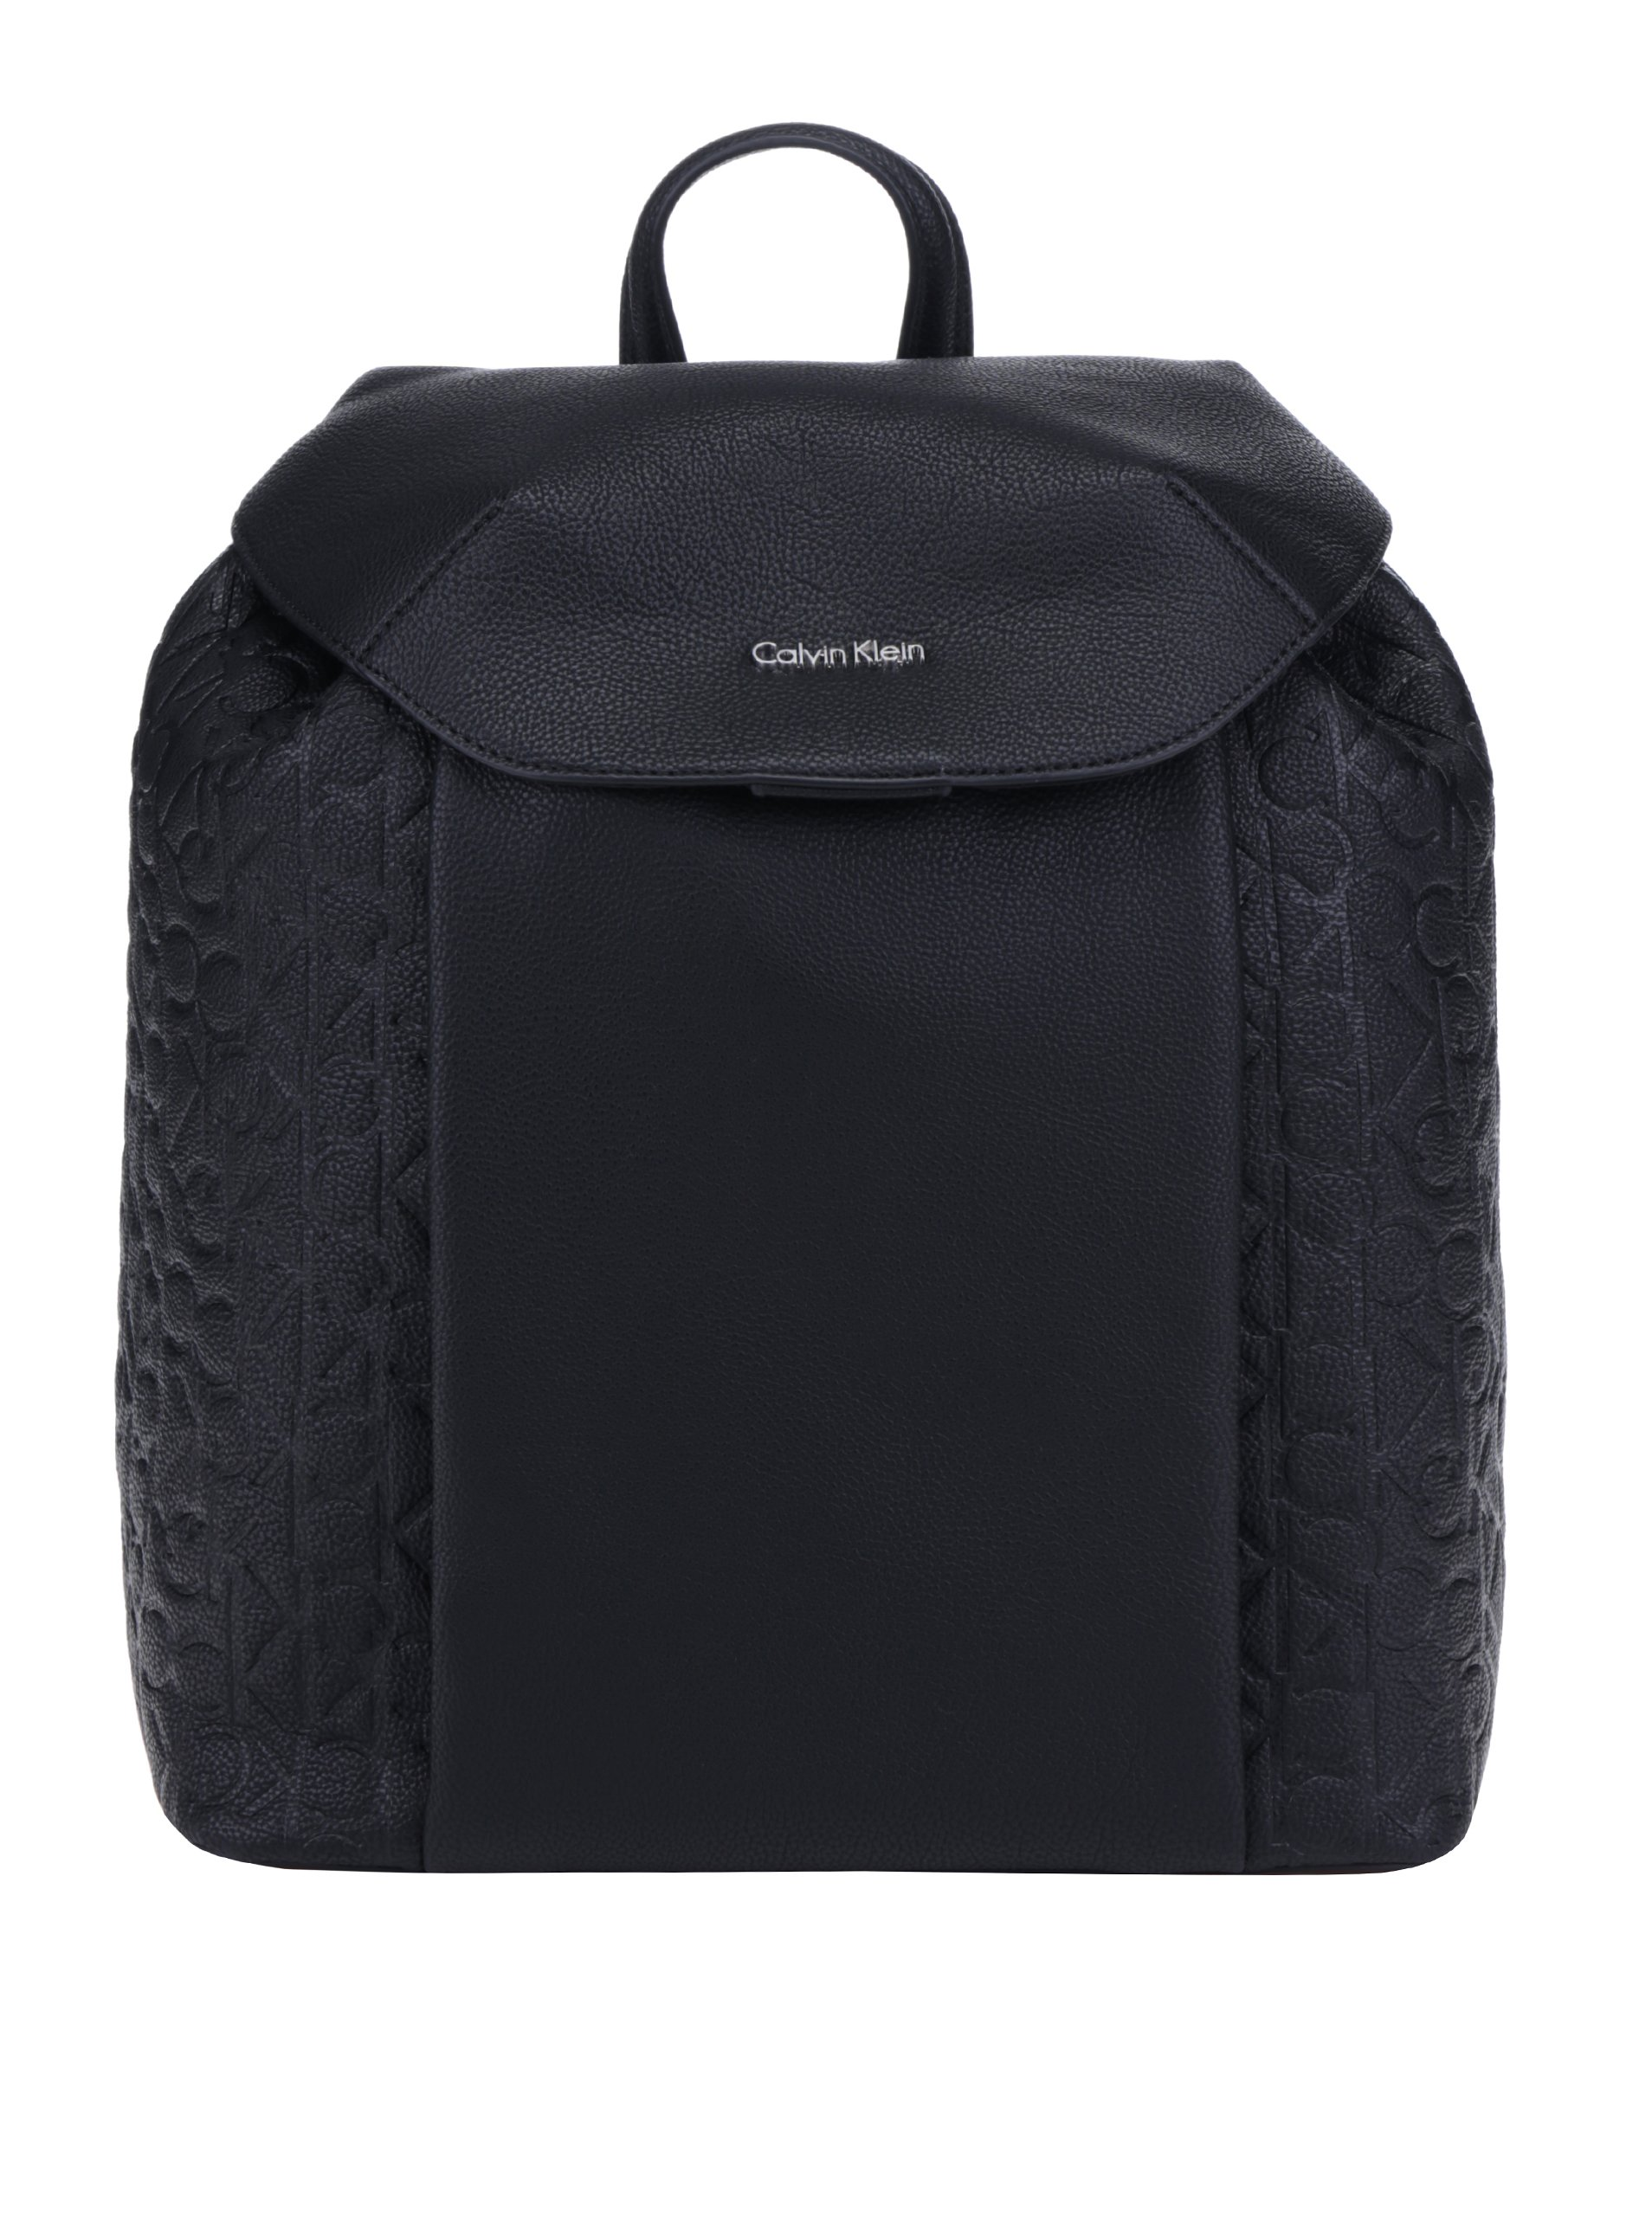 Černý dámský batoh se strukturovanými detaily Calvin Klein Jeans Misha 040cd0b2bc